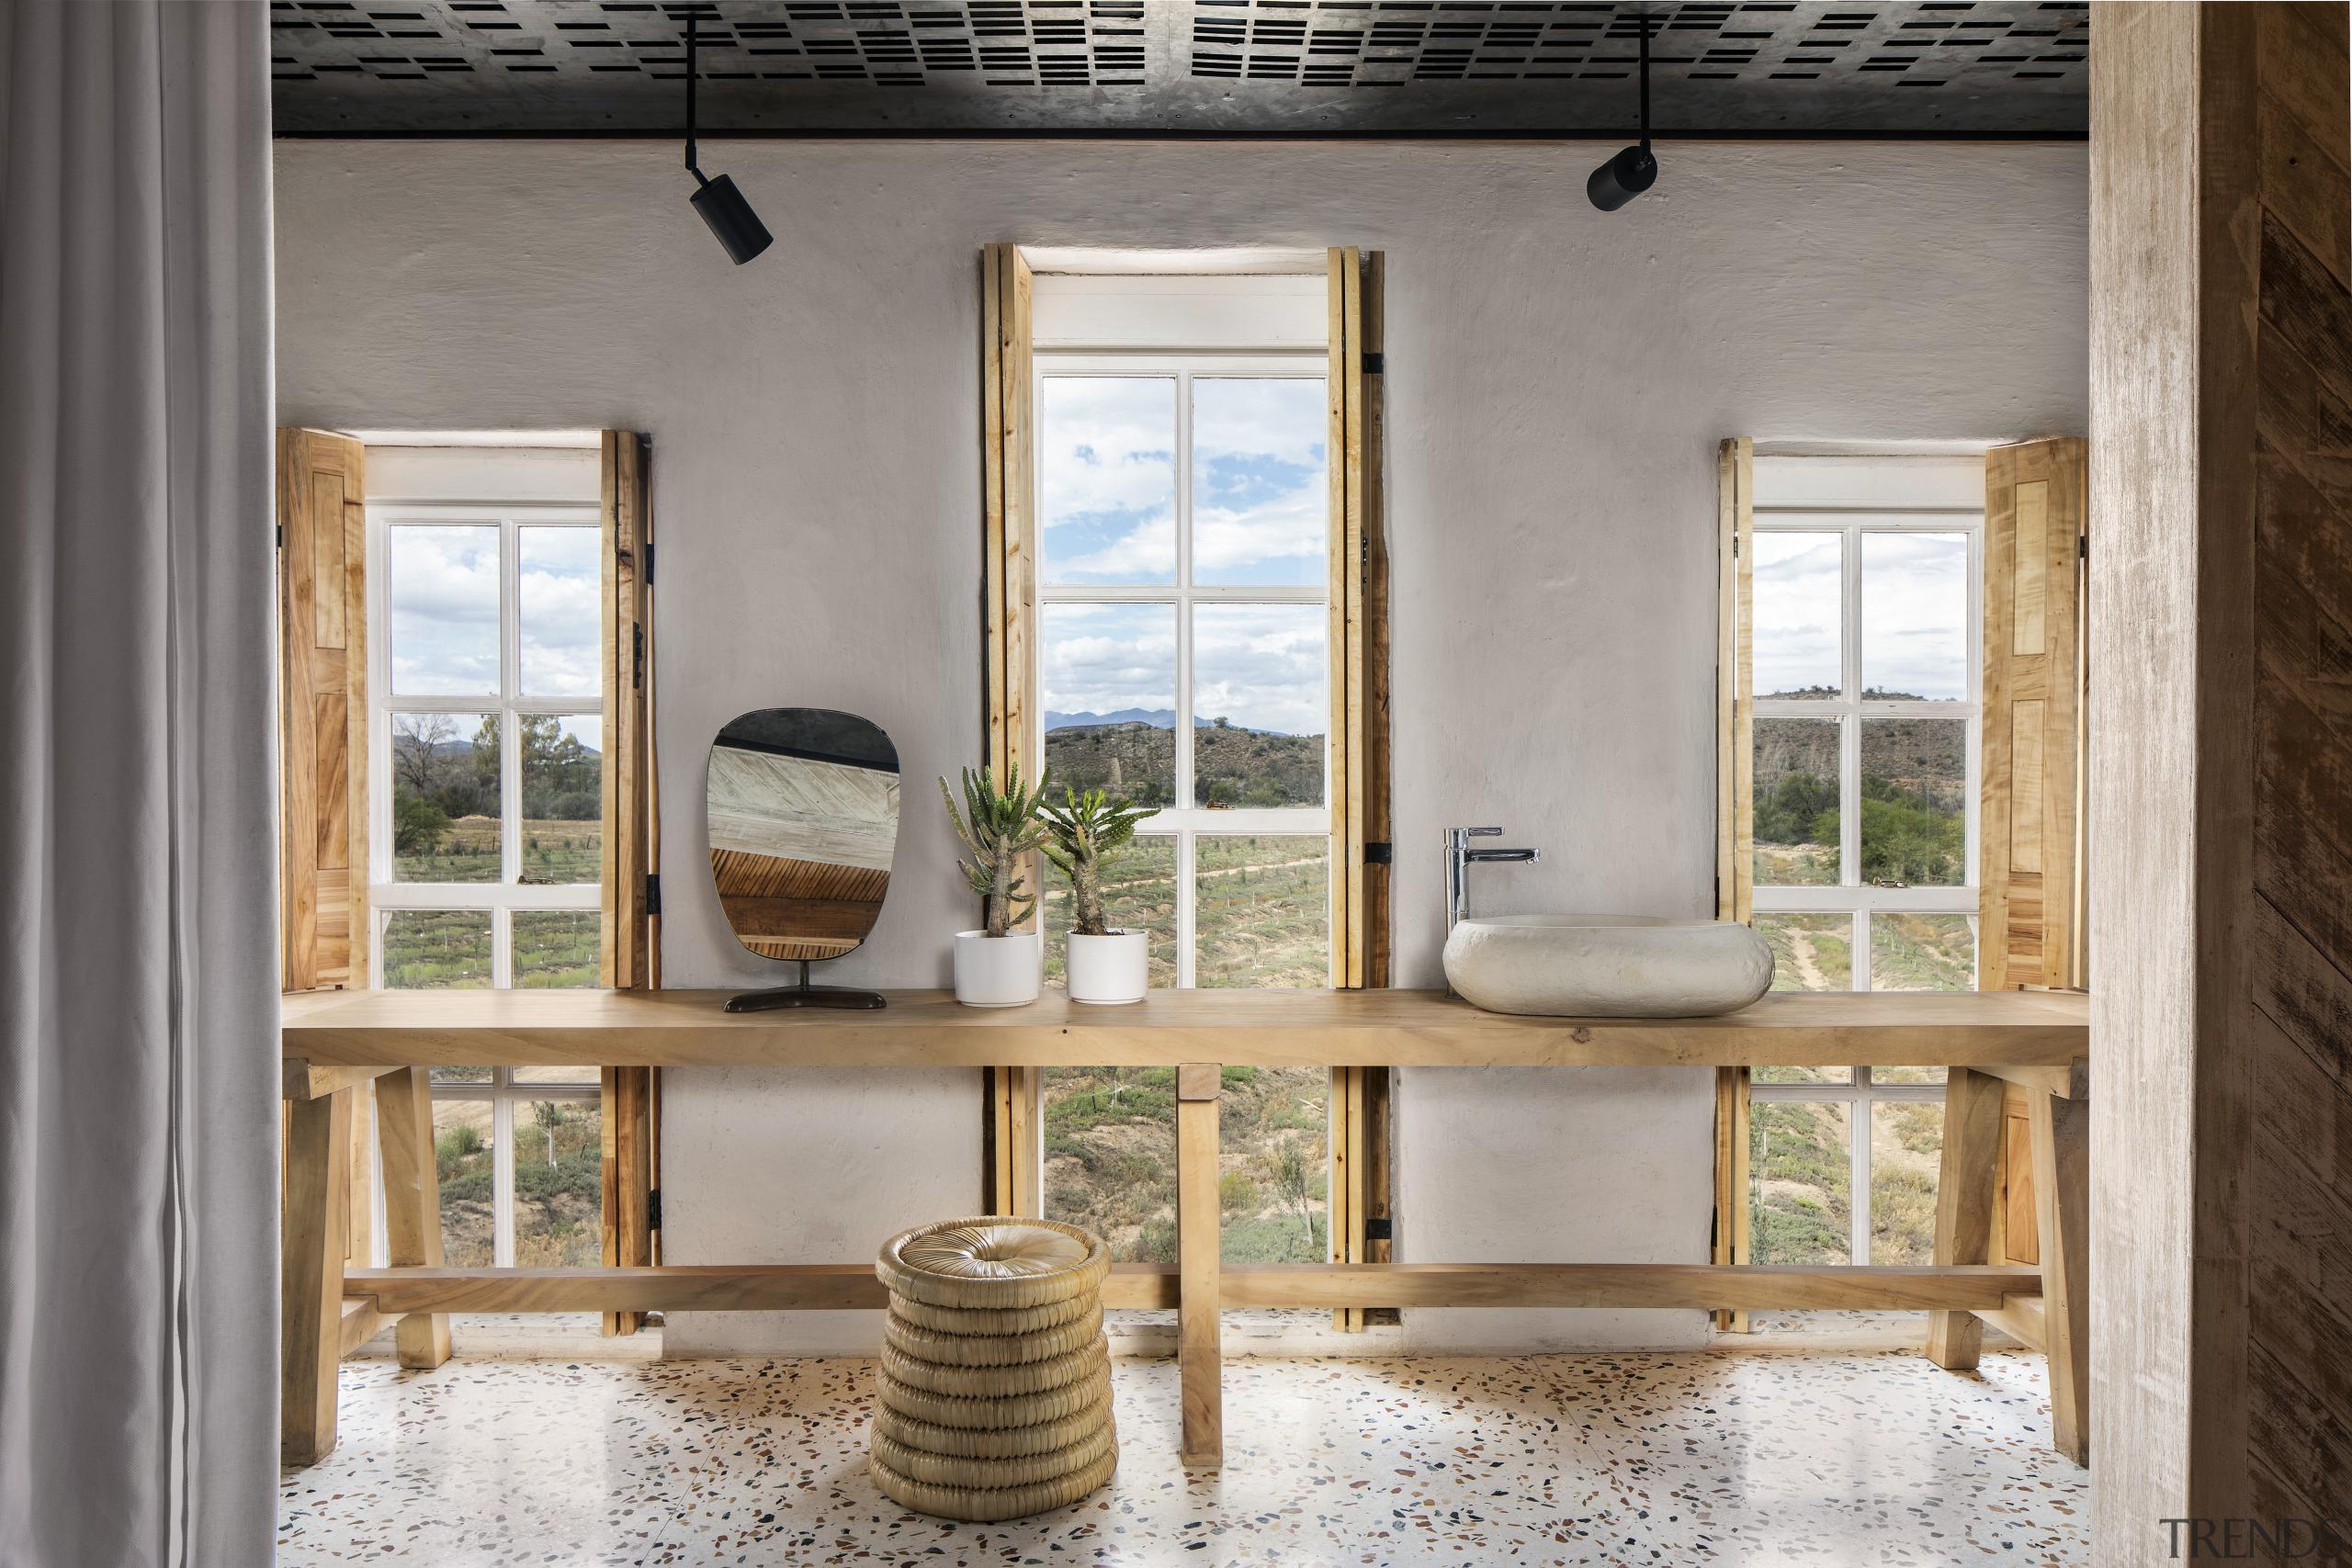 The bathroom combines contemporary materials such as terrazzo